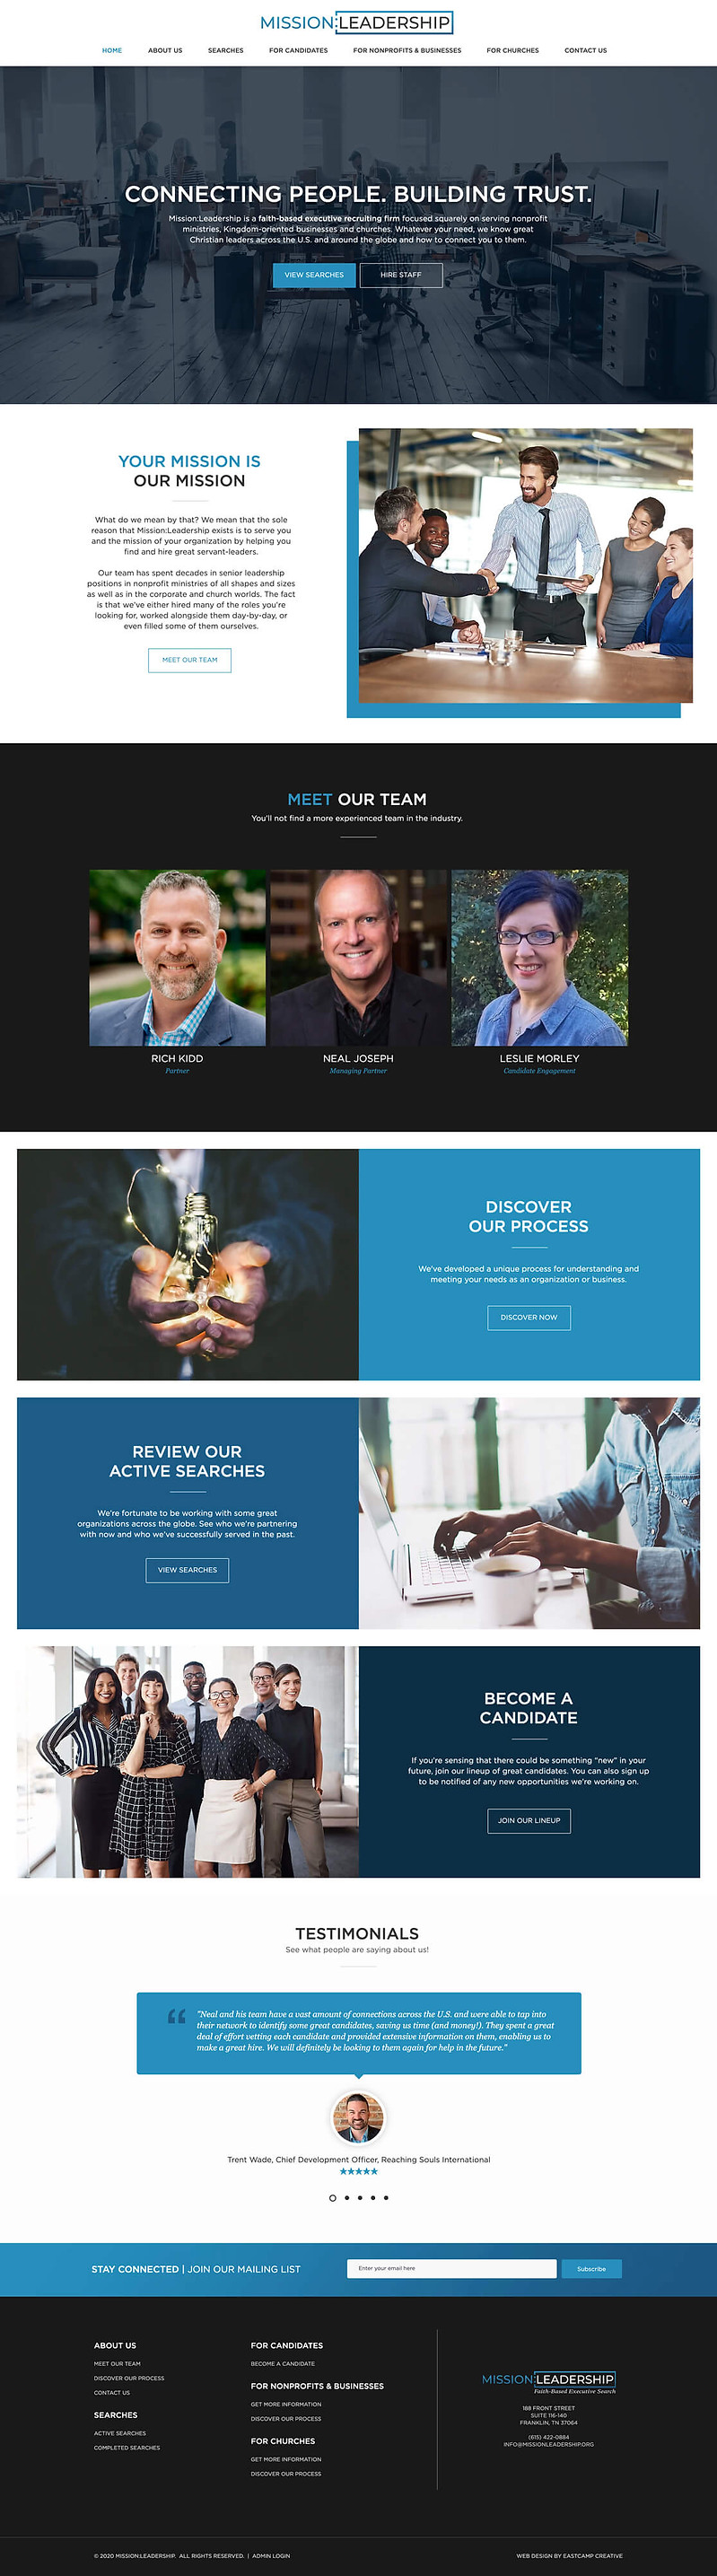 nonprofit recruiter website design, church staffing website design